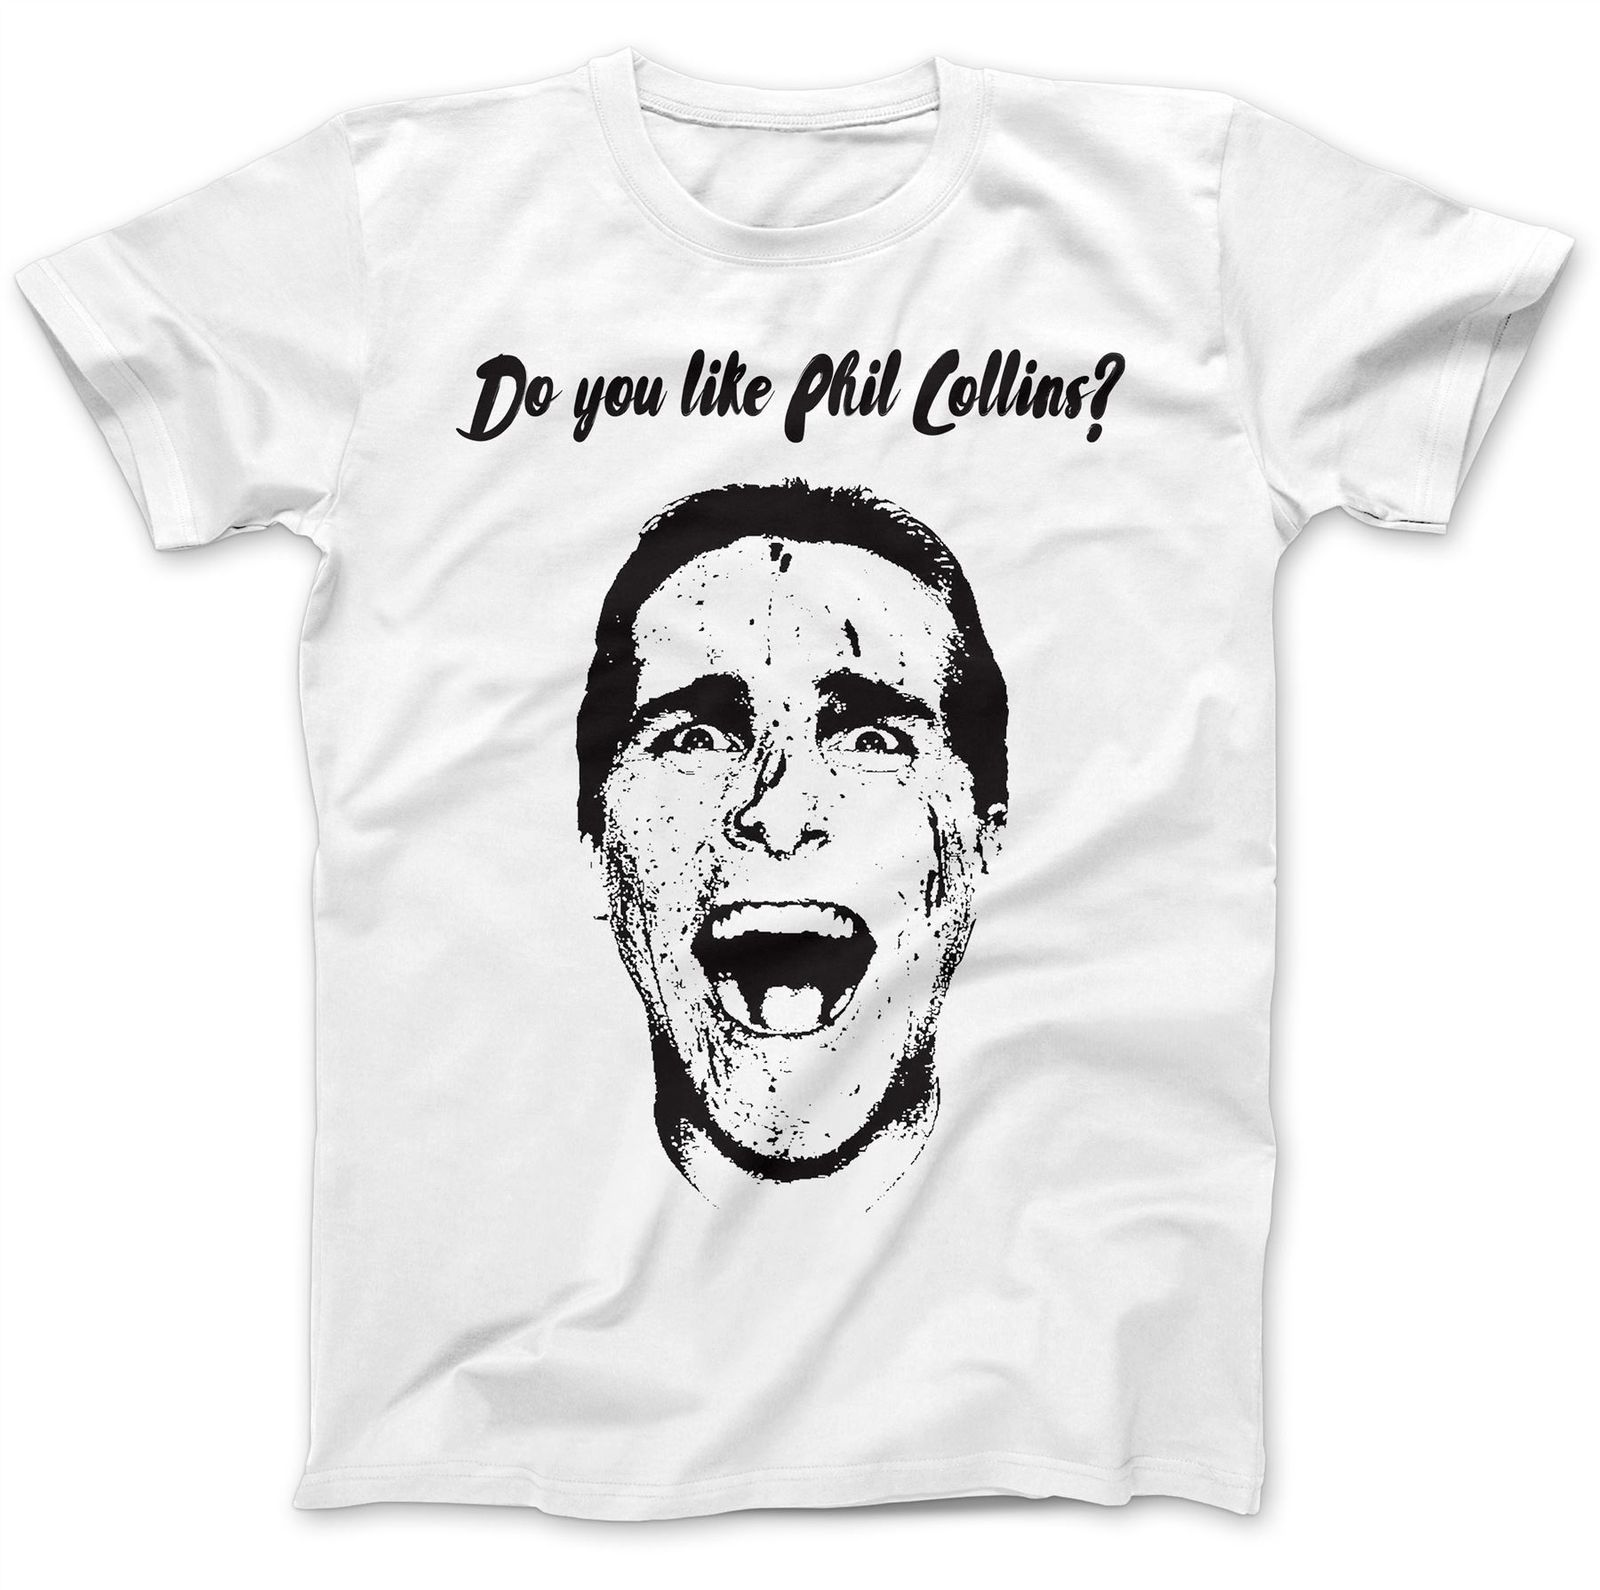 Christian Bale T-Shirt 100% Premium Cotton Printed Summer Style Tees Male Harajuku Top Fitness Brand Clothing Slim